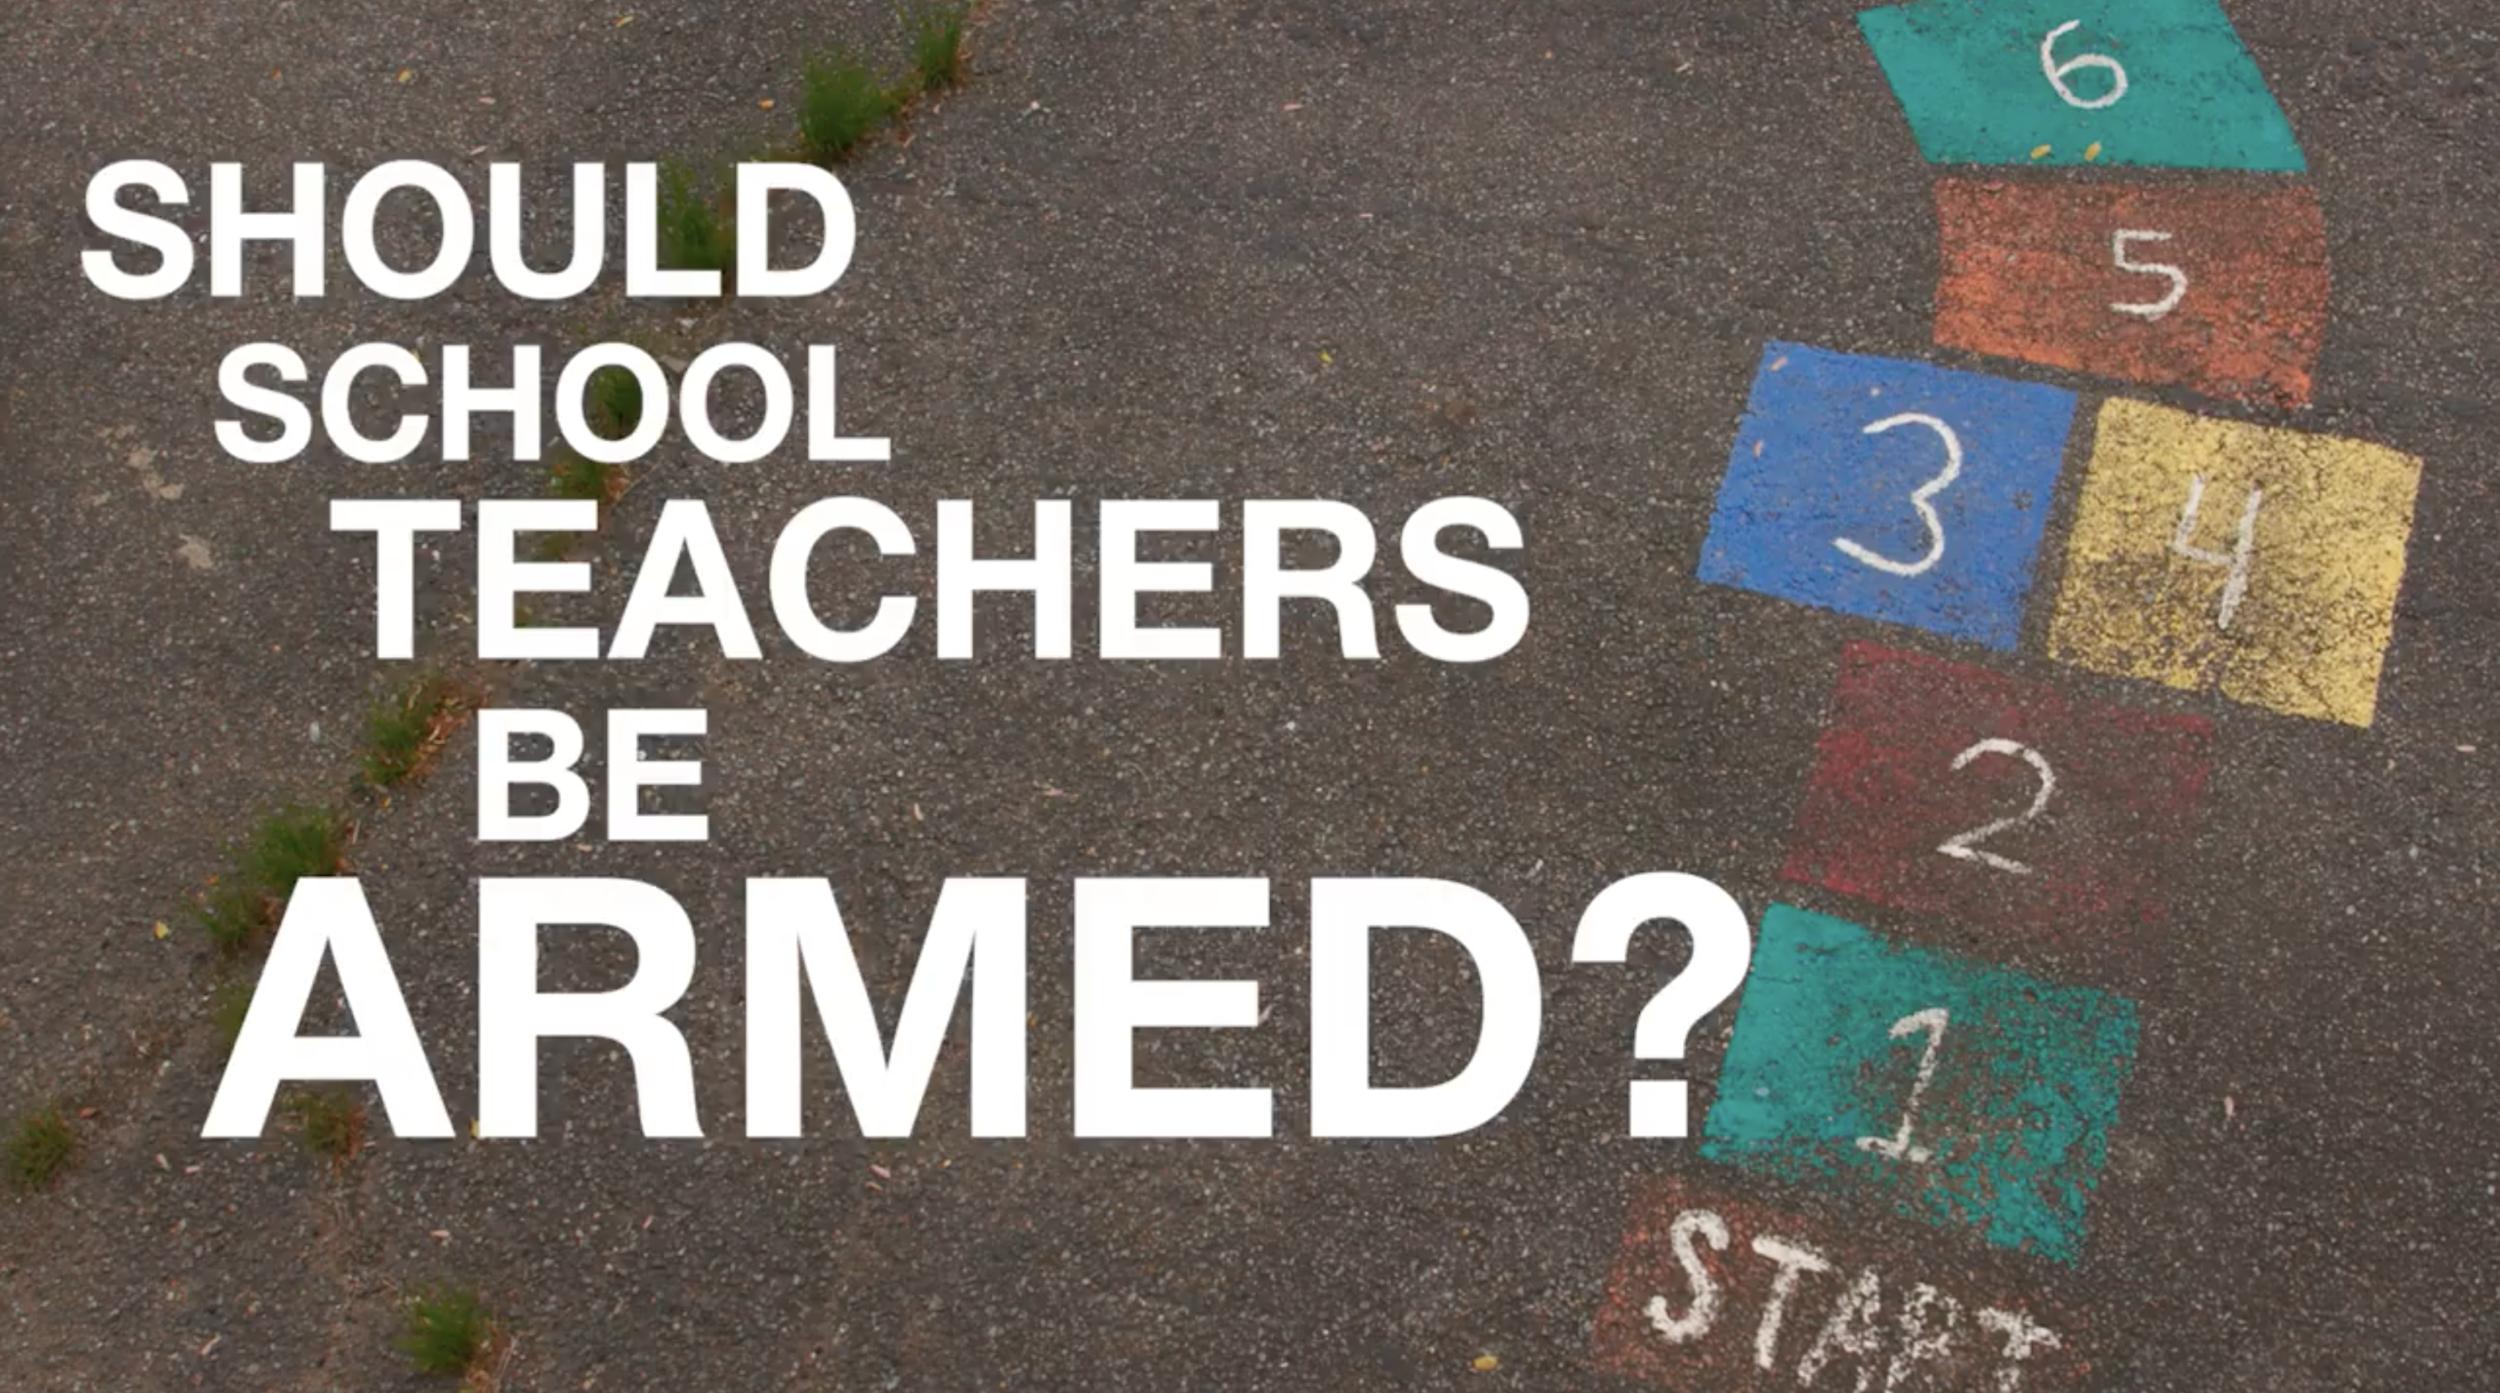 Arming Teachers